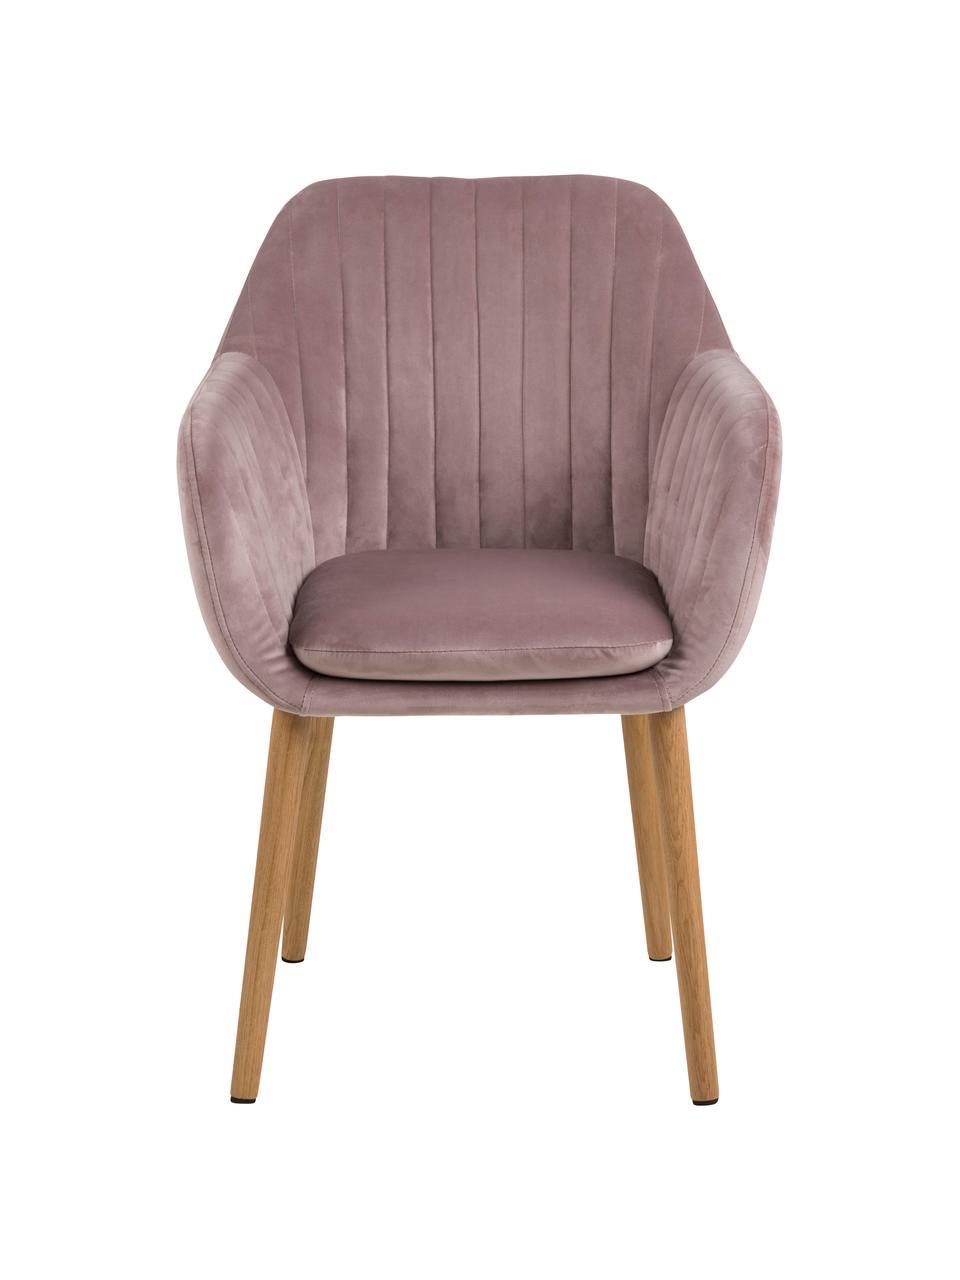 Chaise velours rose avec accoudoirs Emilia, Velours rose, pieds chêne